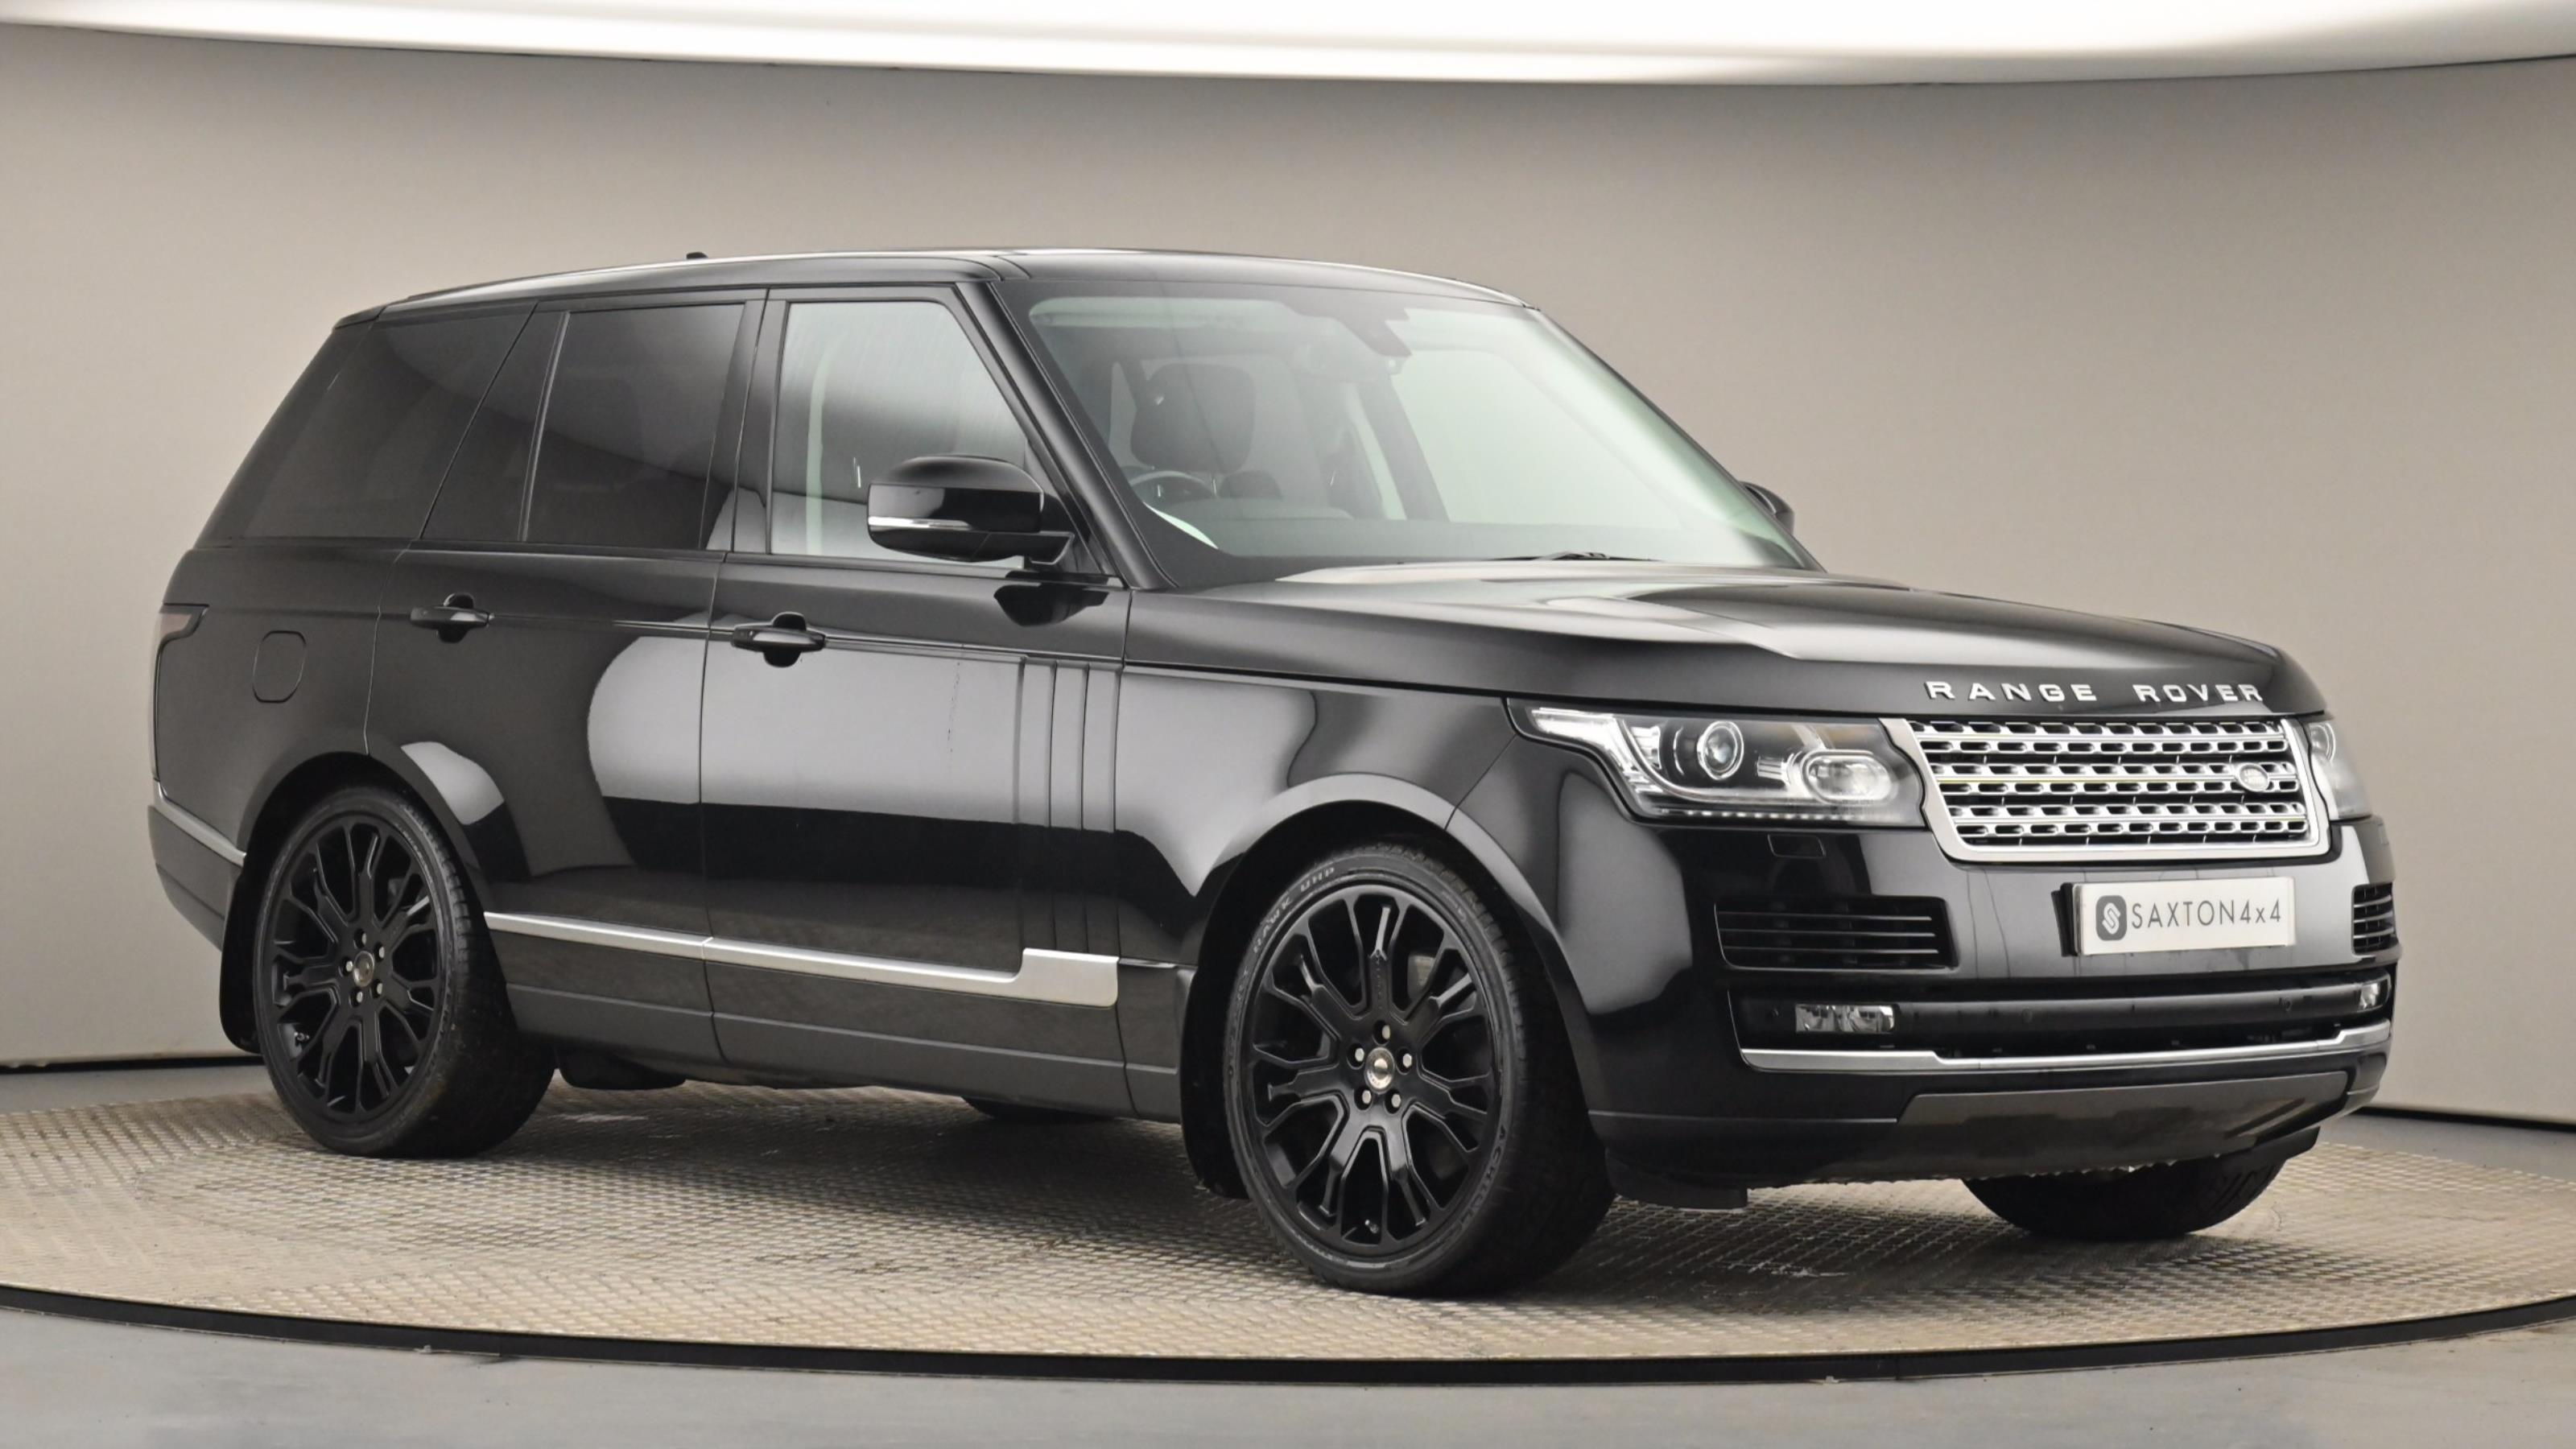 Used 2015 Land Rover RANGE ROVER 4.4 SDV8 Vogue 4dr Auto BLACK at Saxton4x4